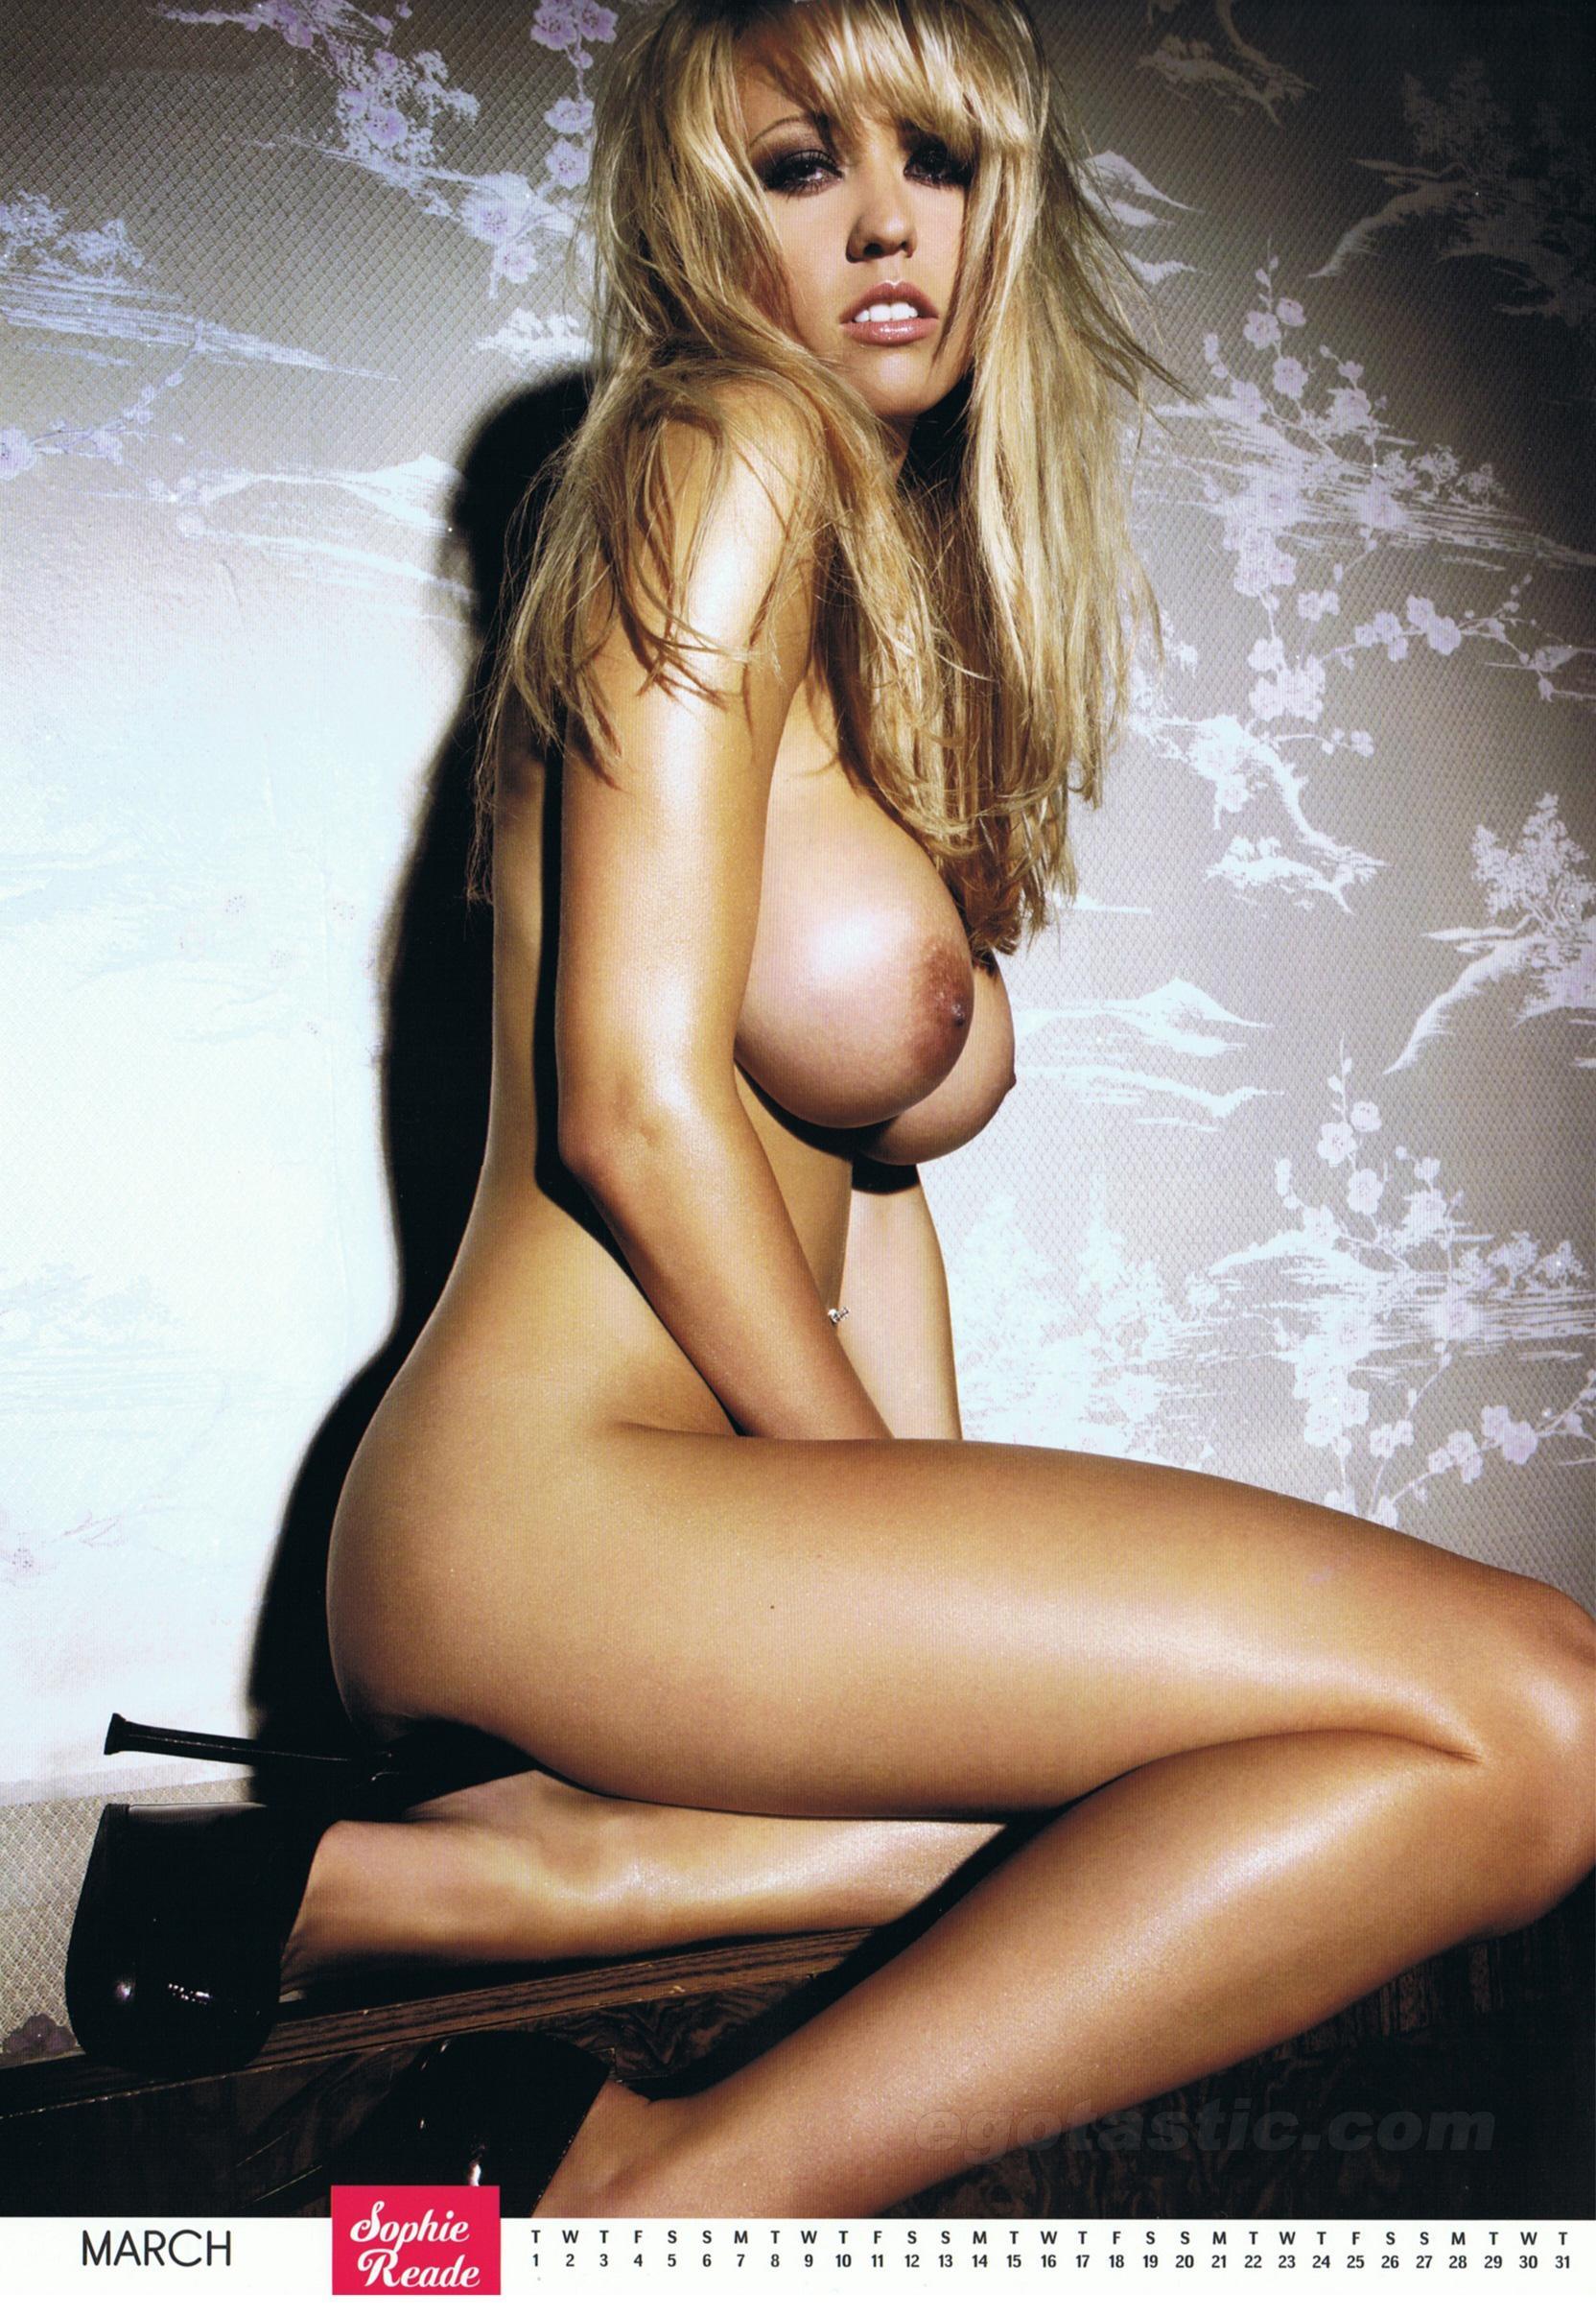 Nude girls age hannah montana miley cyrus nude